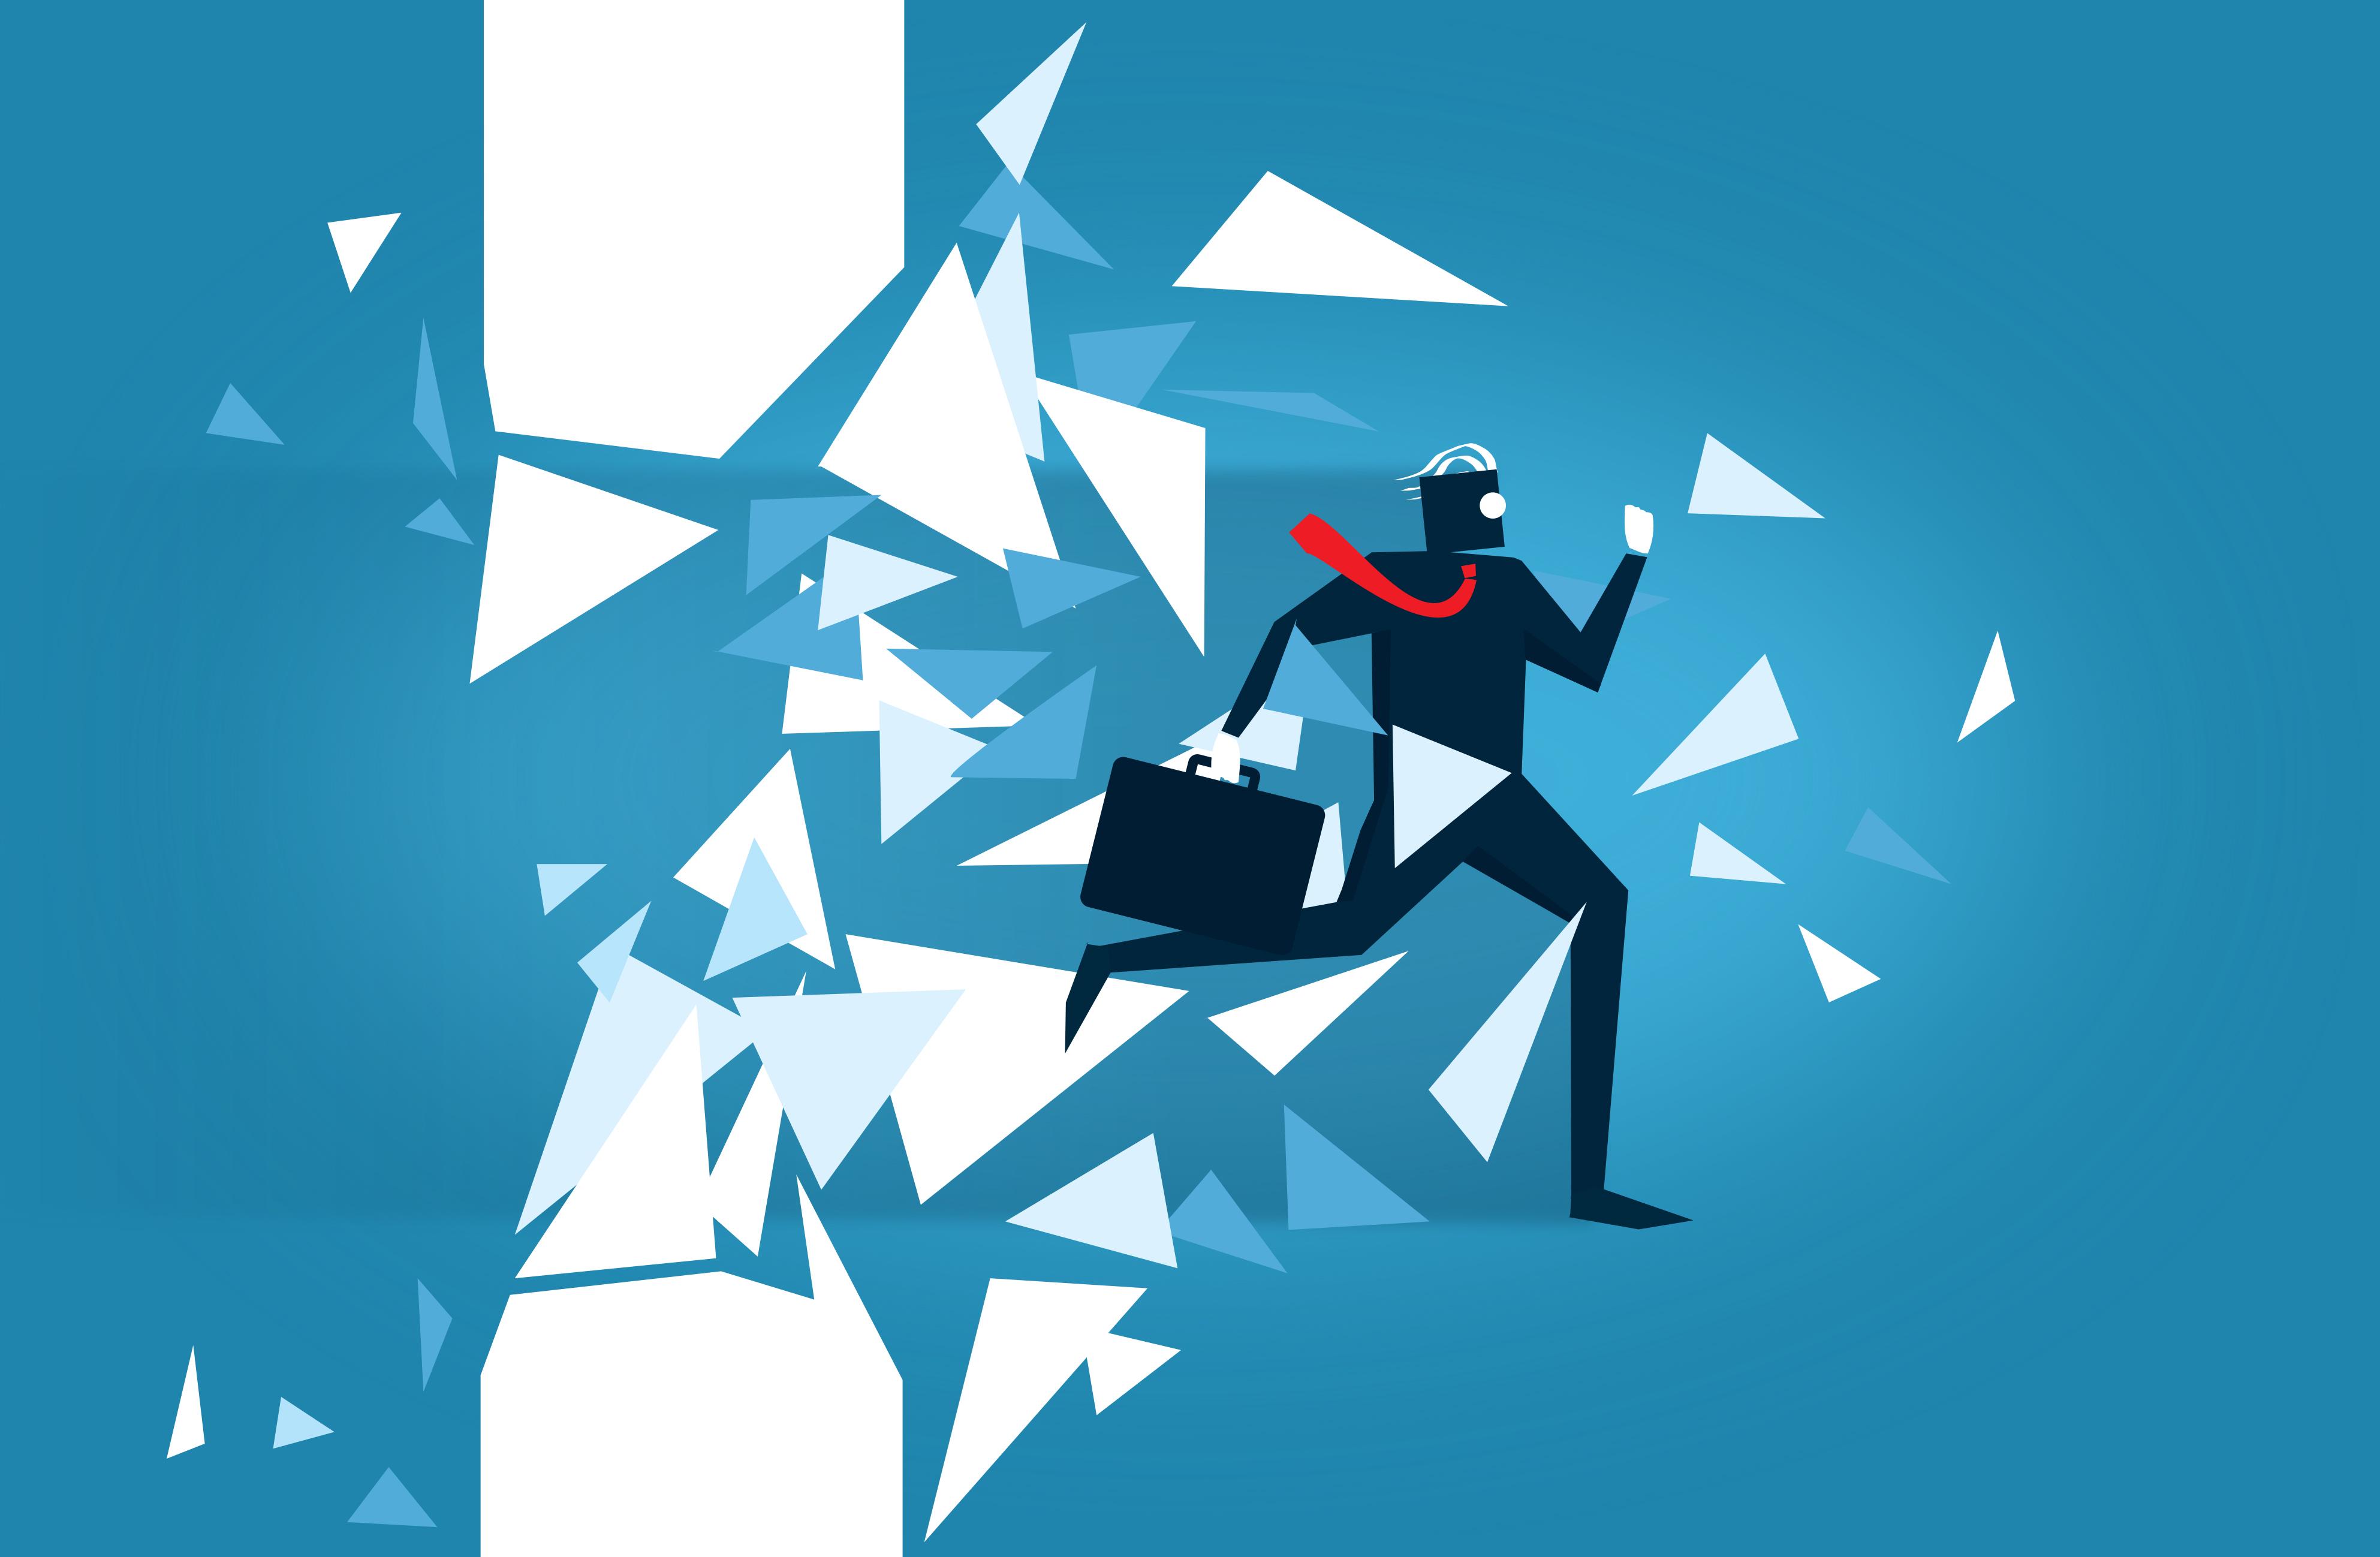 Businessman Blasting Through a Wall - Overcoming Barriers, Achievement, Message, Plan, Performance, HQ Photo